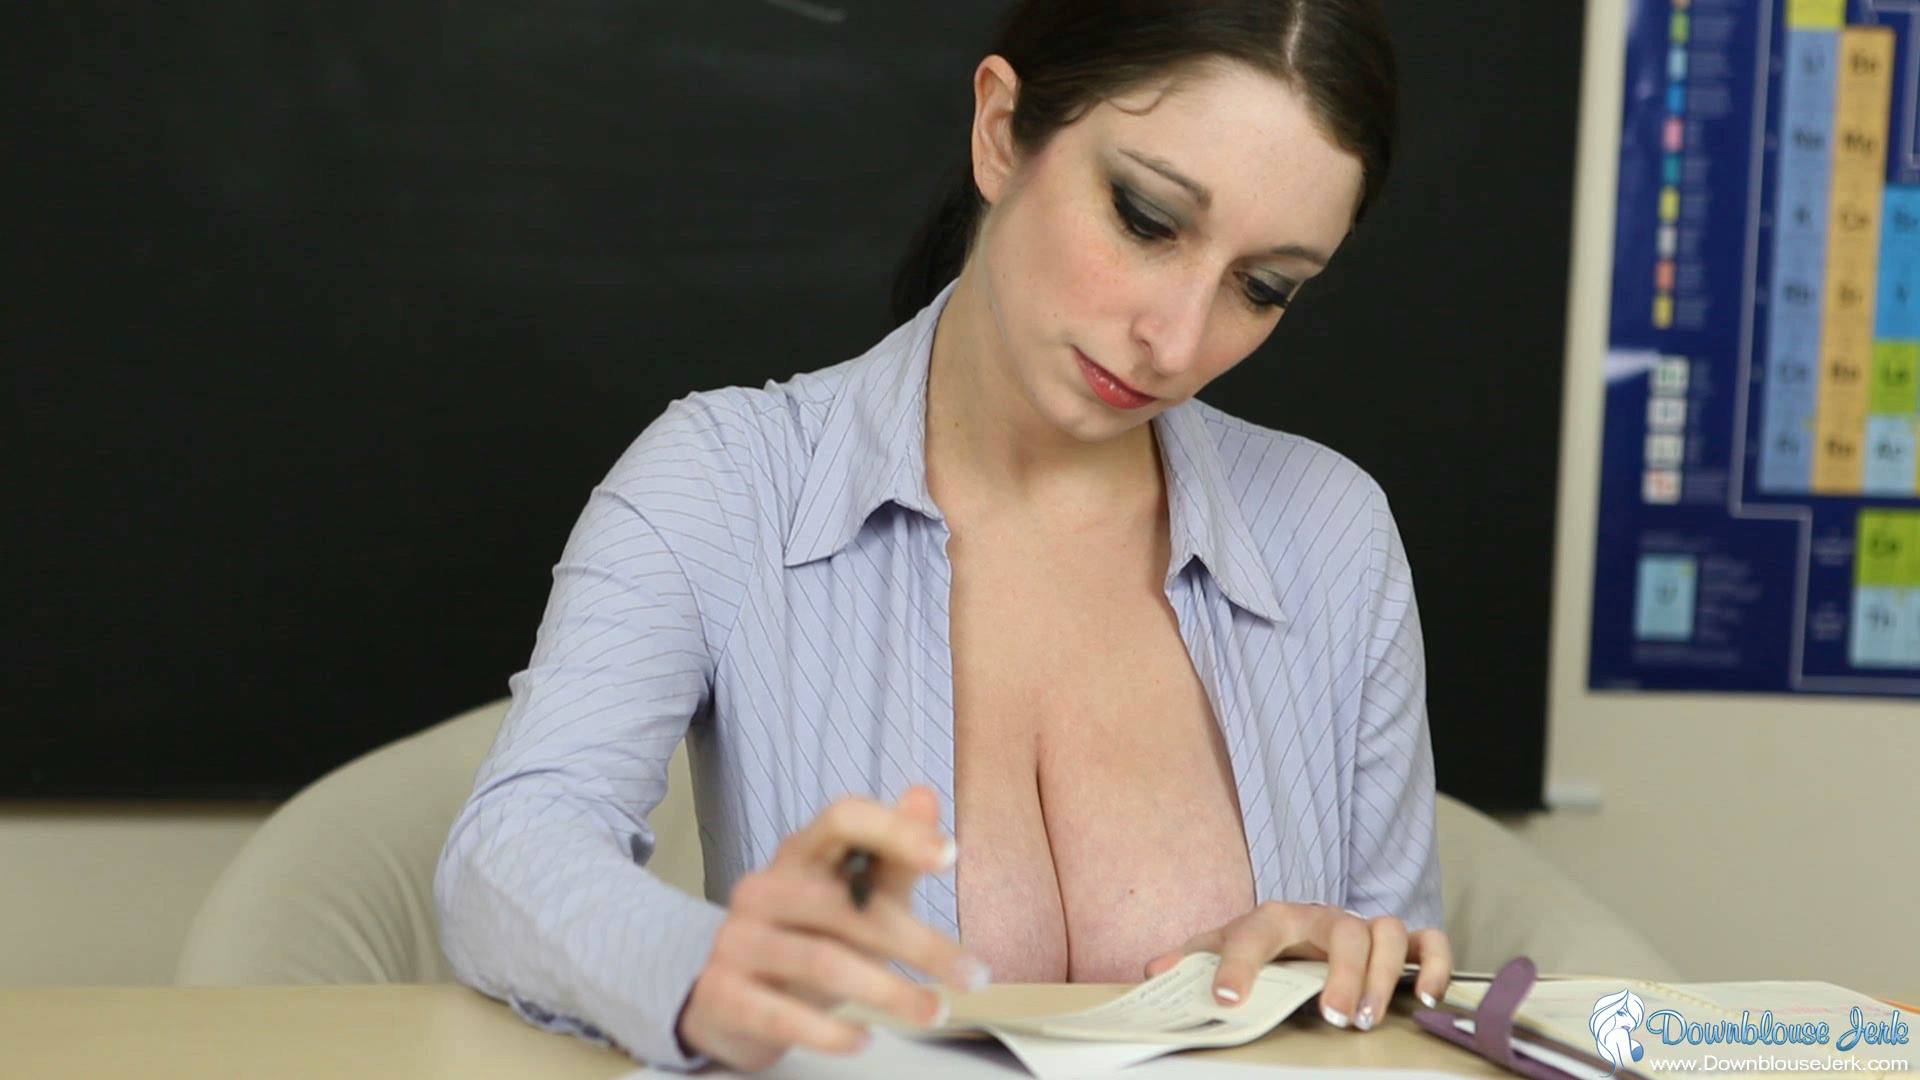 Gemma Lou Teachers Boobs · Gemma Lou Teachers Boobs ...